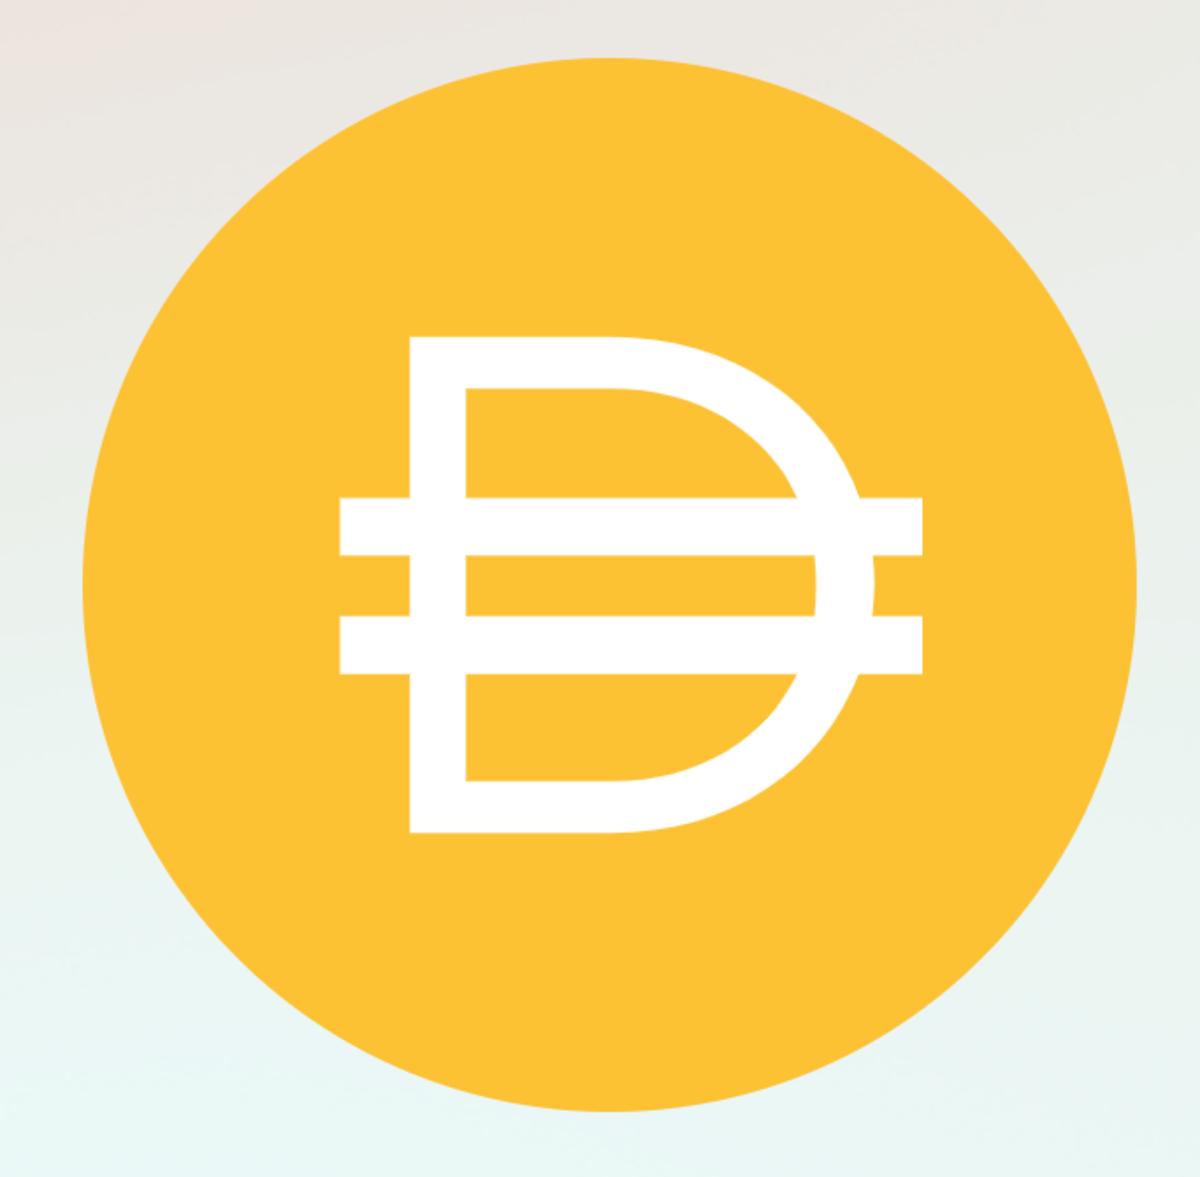 The DAI logo